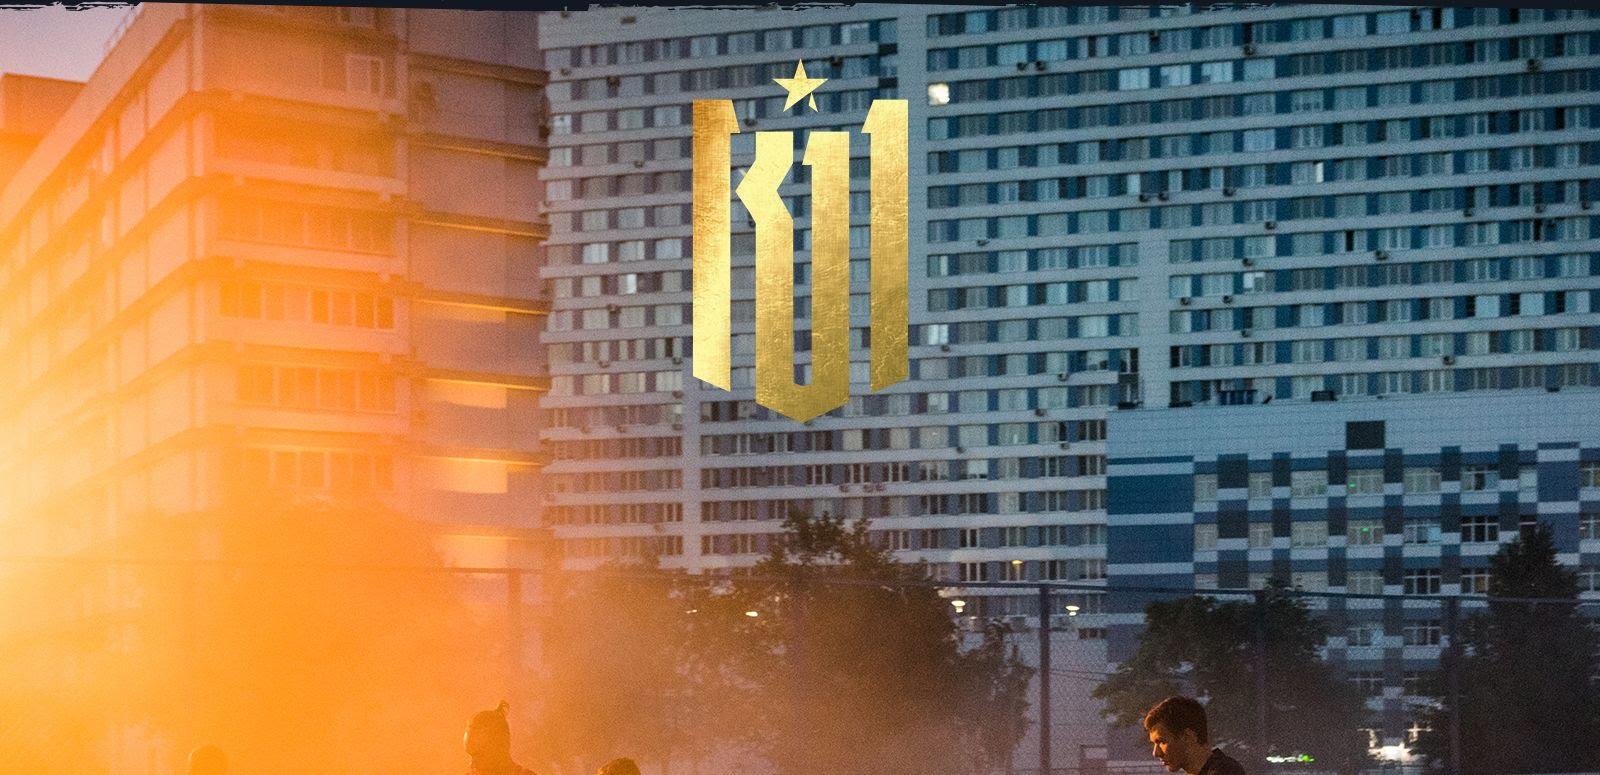 Nike-Russia-K11-SparkBrilliance